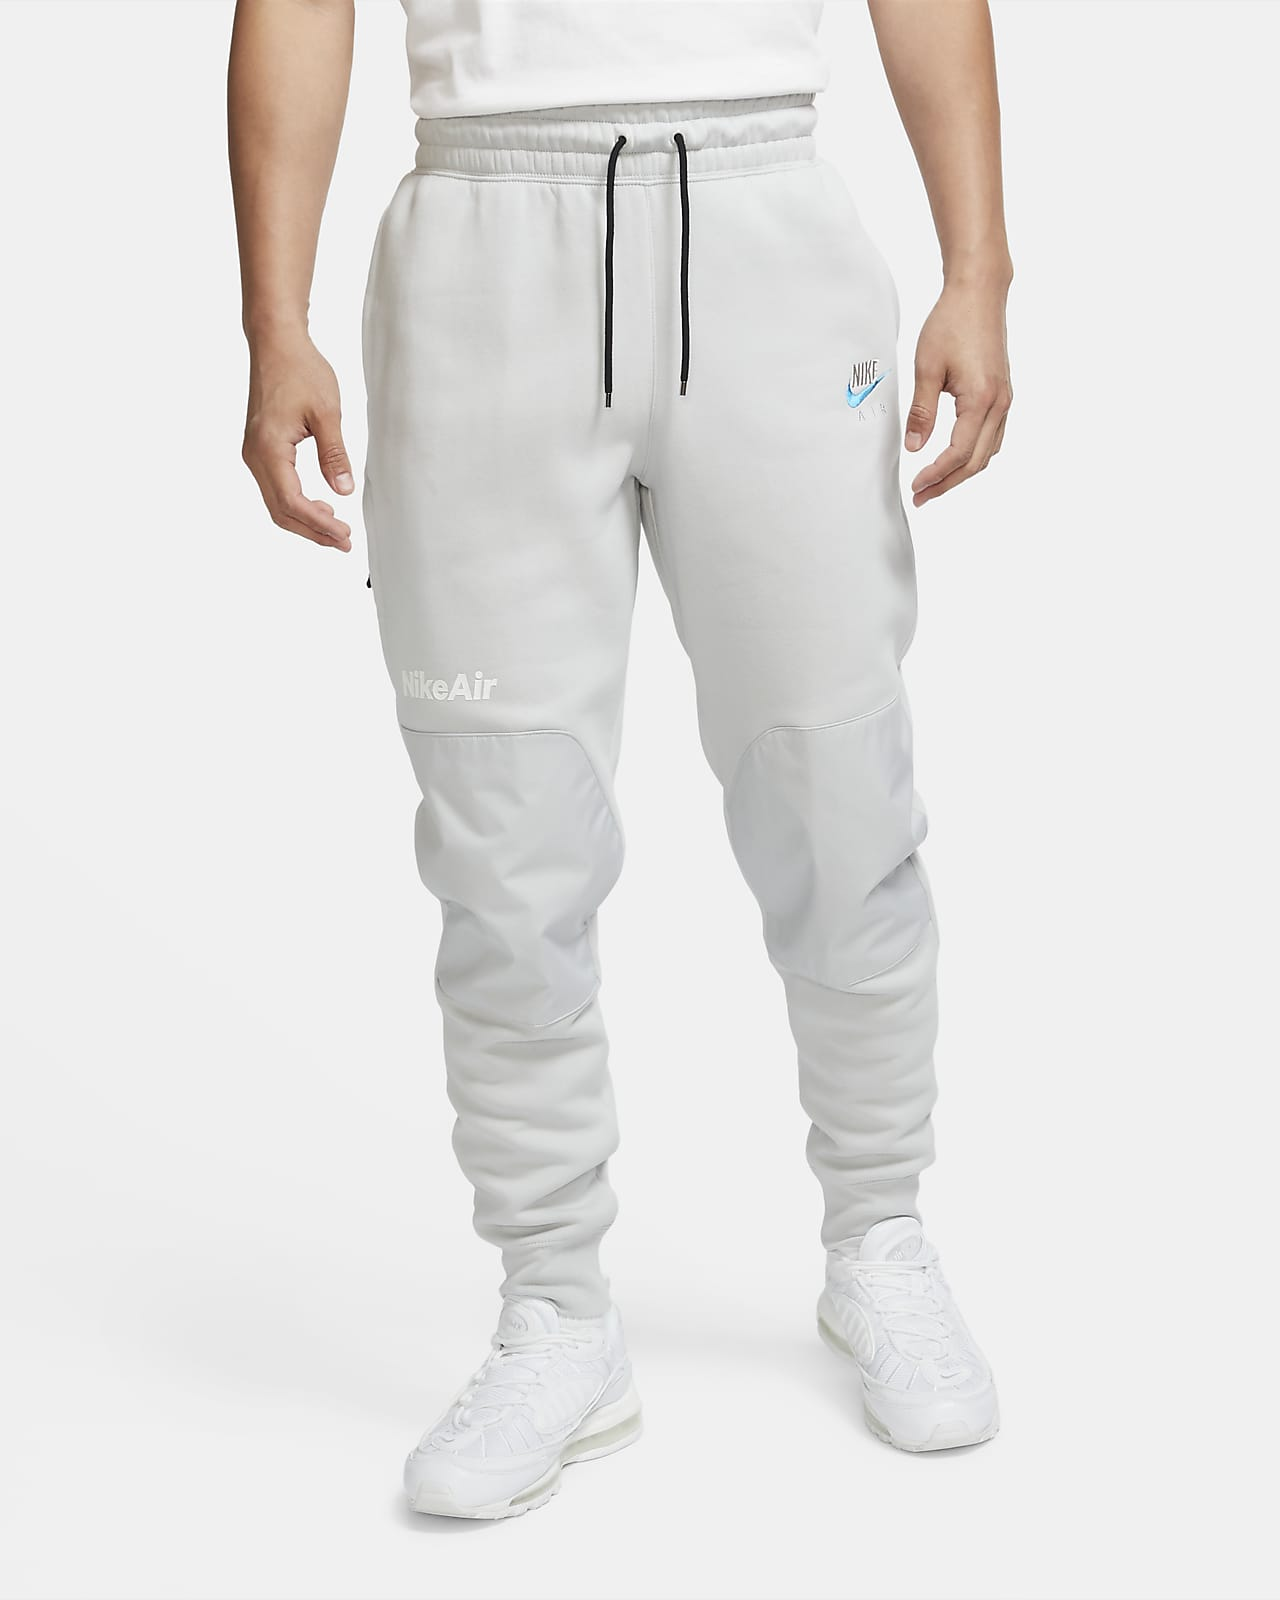 Nike Air Men's Fleece Pants. Nike.com